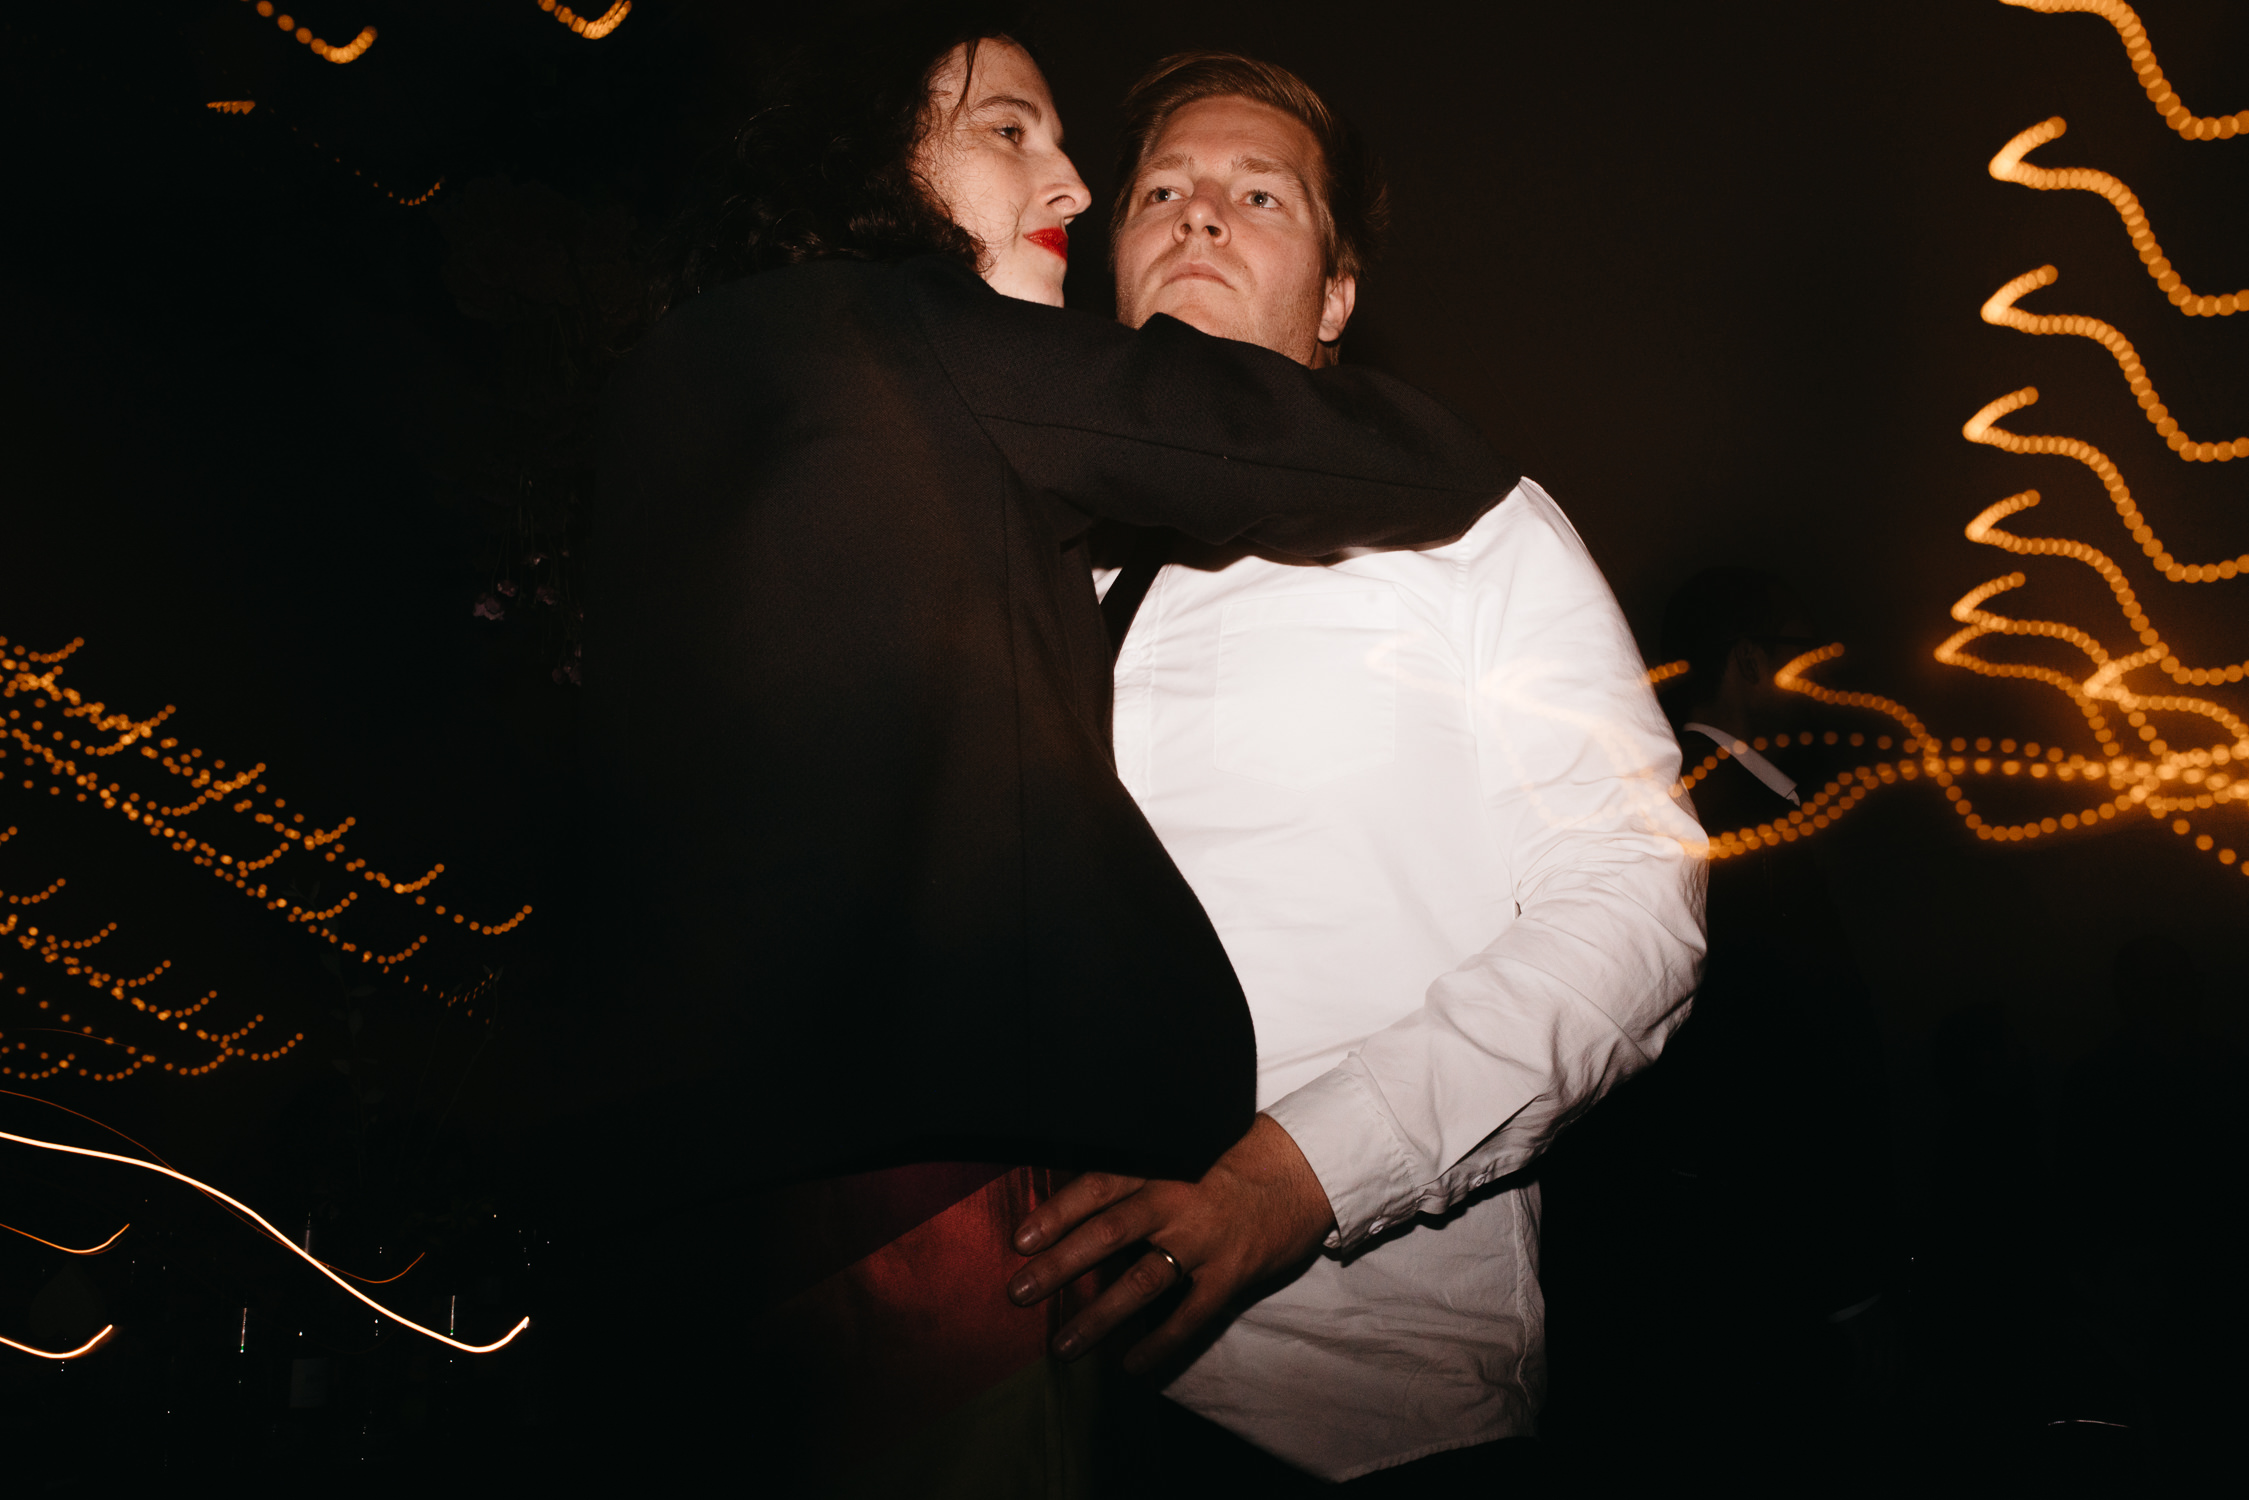 bruidsfotografie-amsterdam-utrecht-mark-hadden-wedding-photography-_DSC5201.jpg